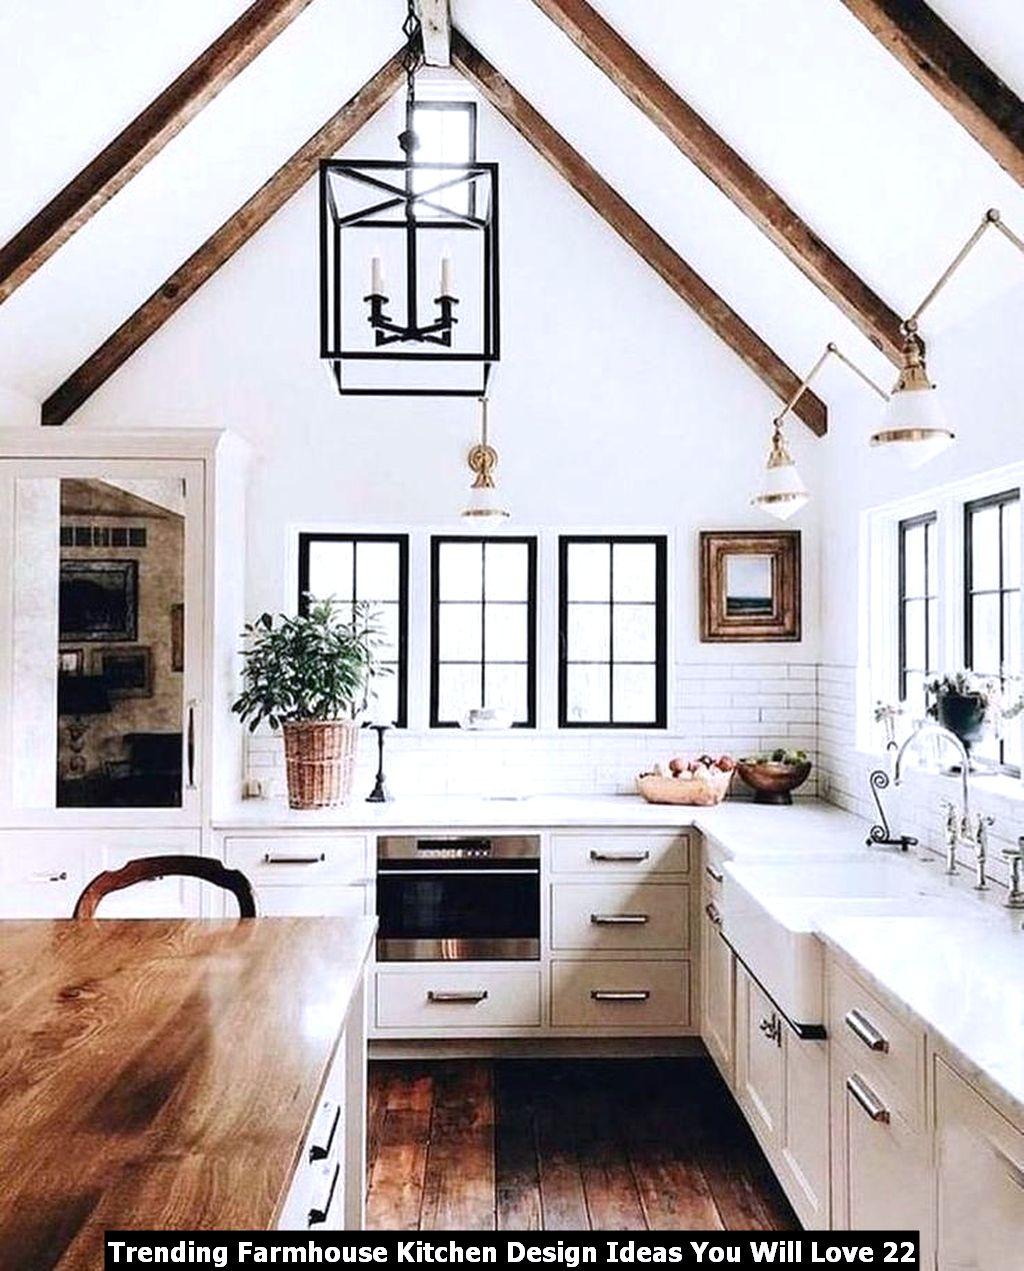 Trending Farmhouse Kitchen Design Ideas You Will Love 22